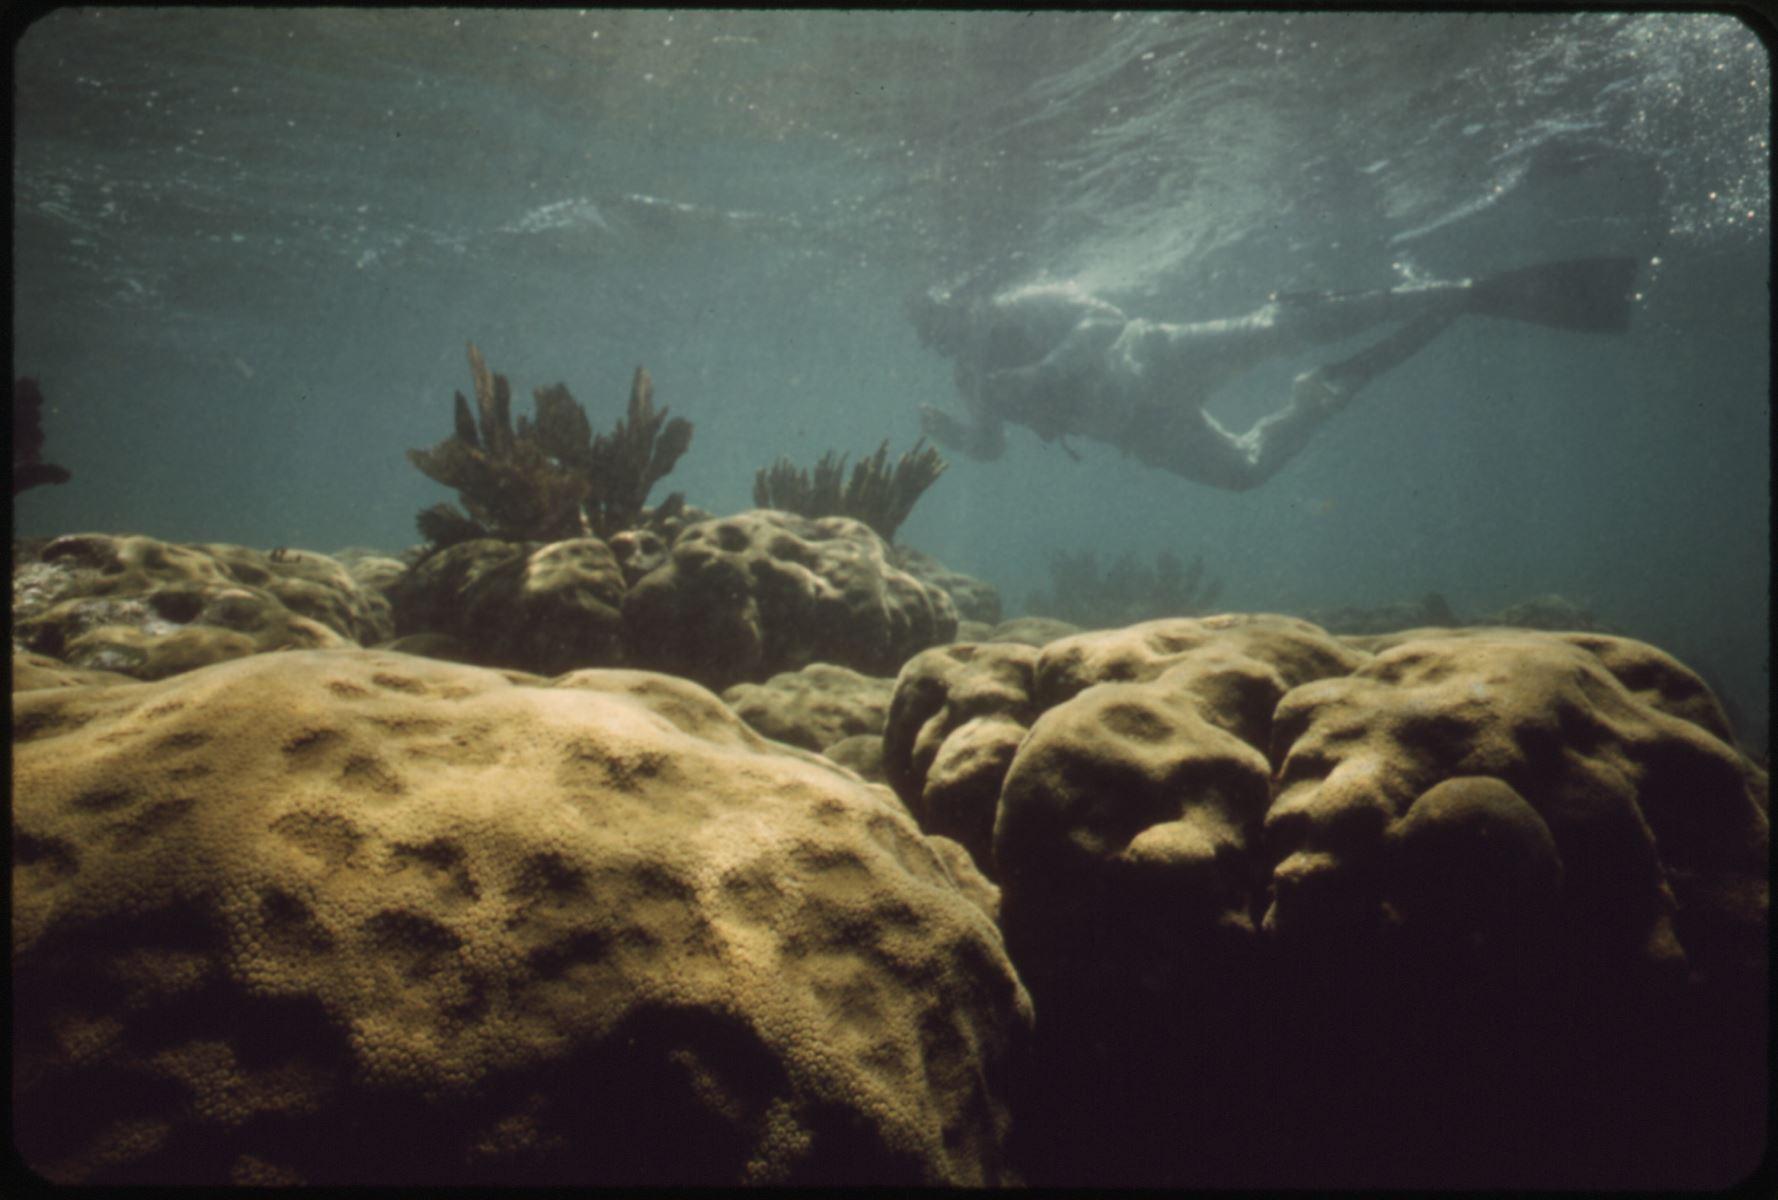 John Pennekamp Key Largo Diving